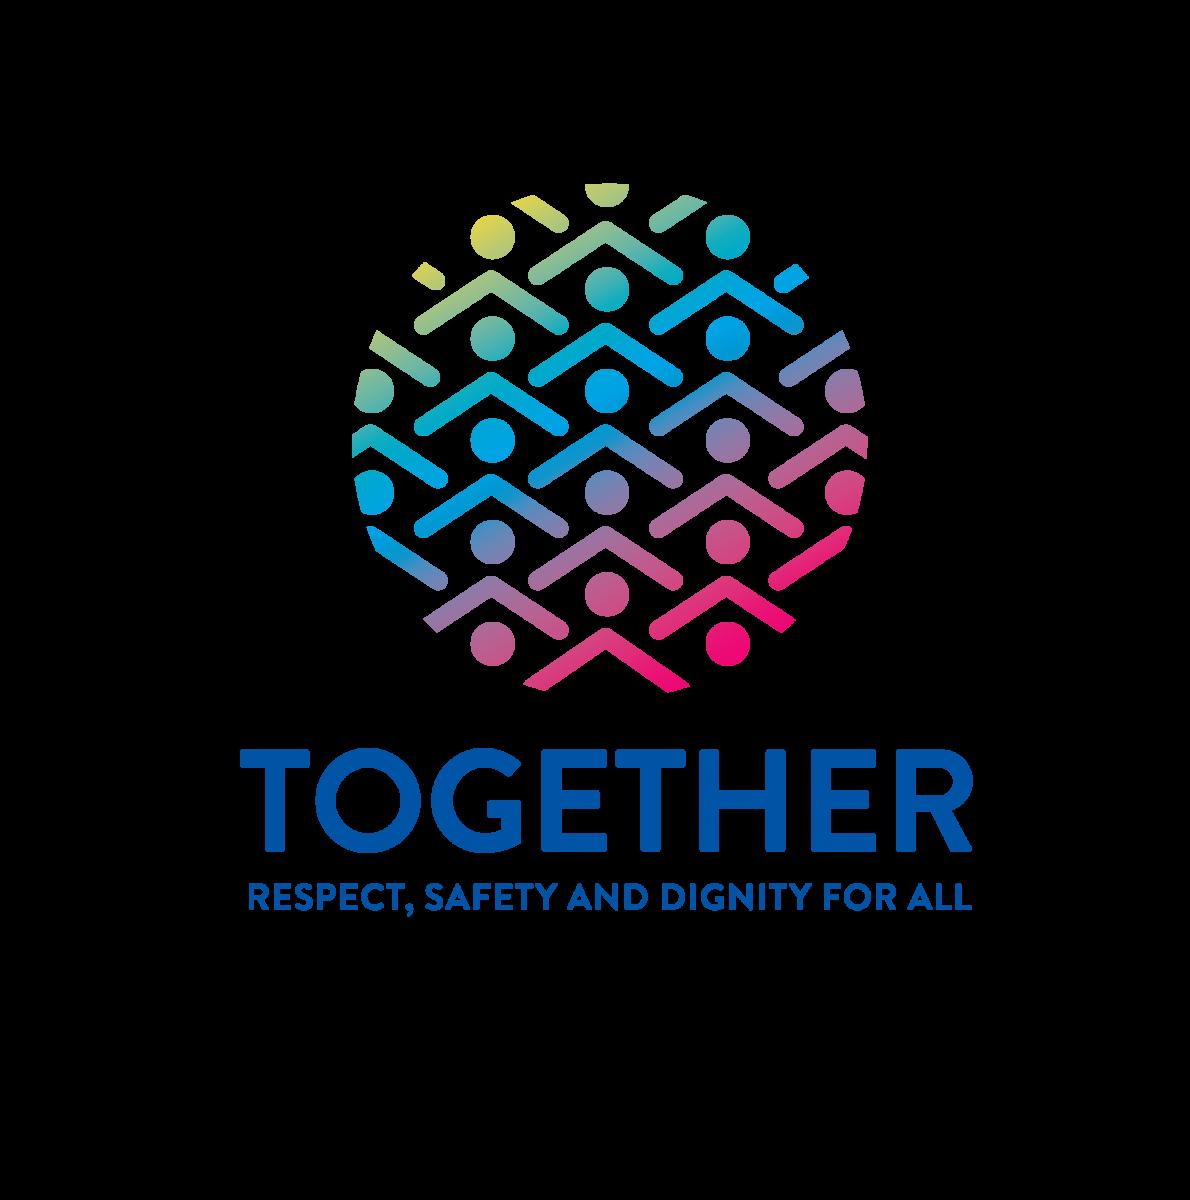 UN Together